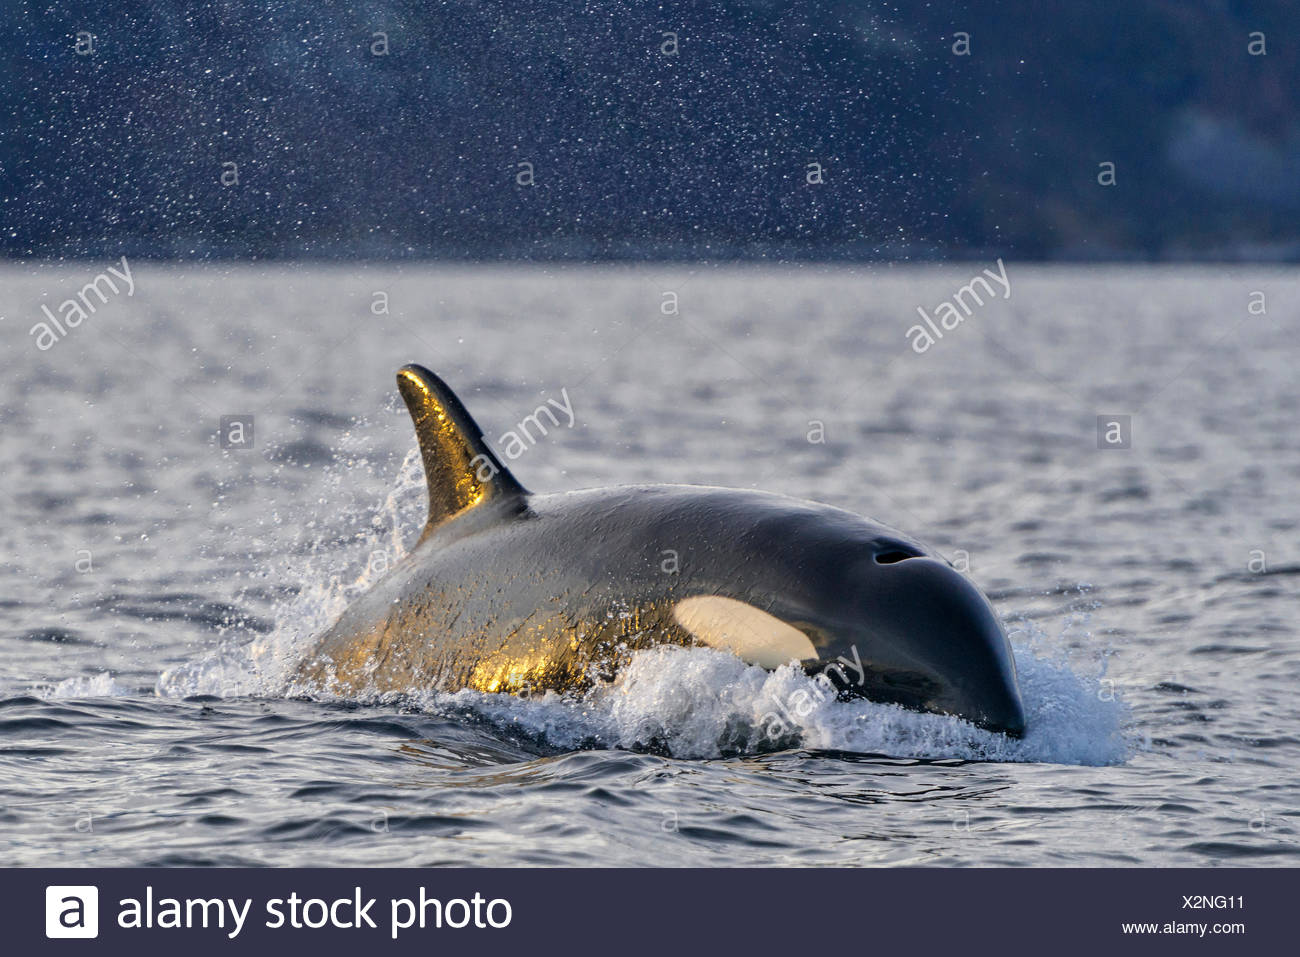 Orca (Orcinus orca), North Atlantic, at Tromvik, Norway - Stock Image